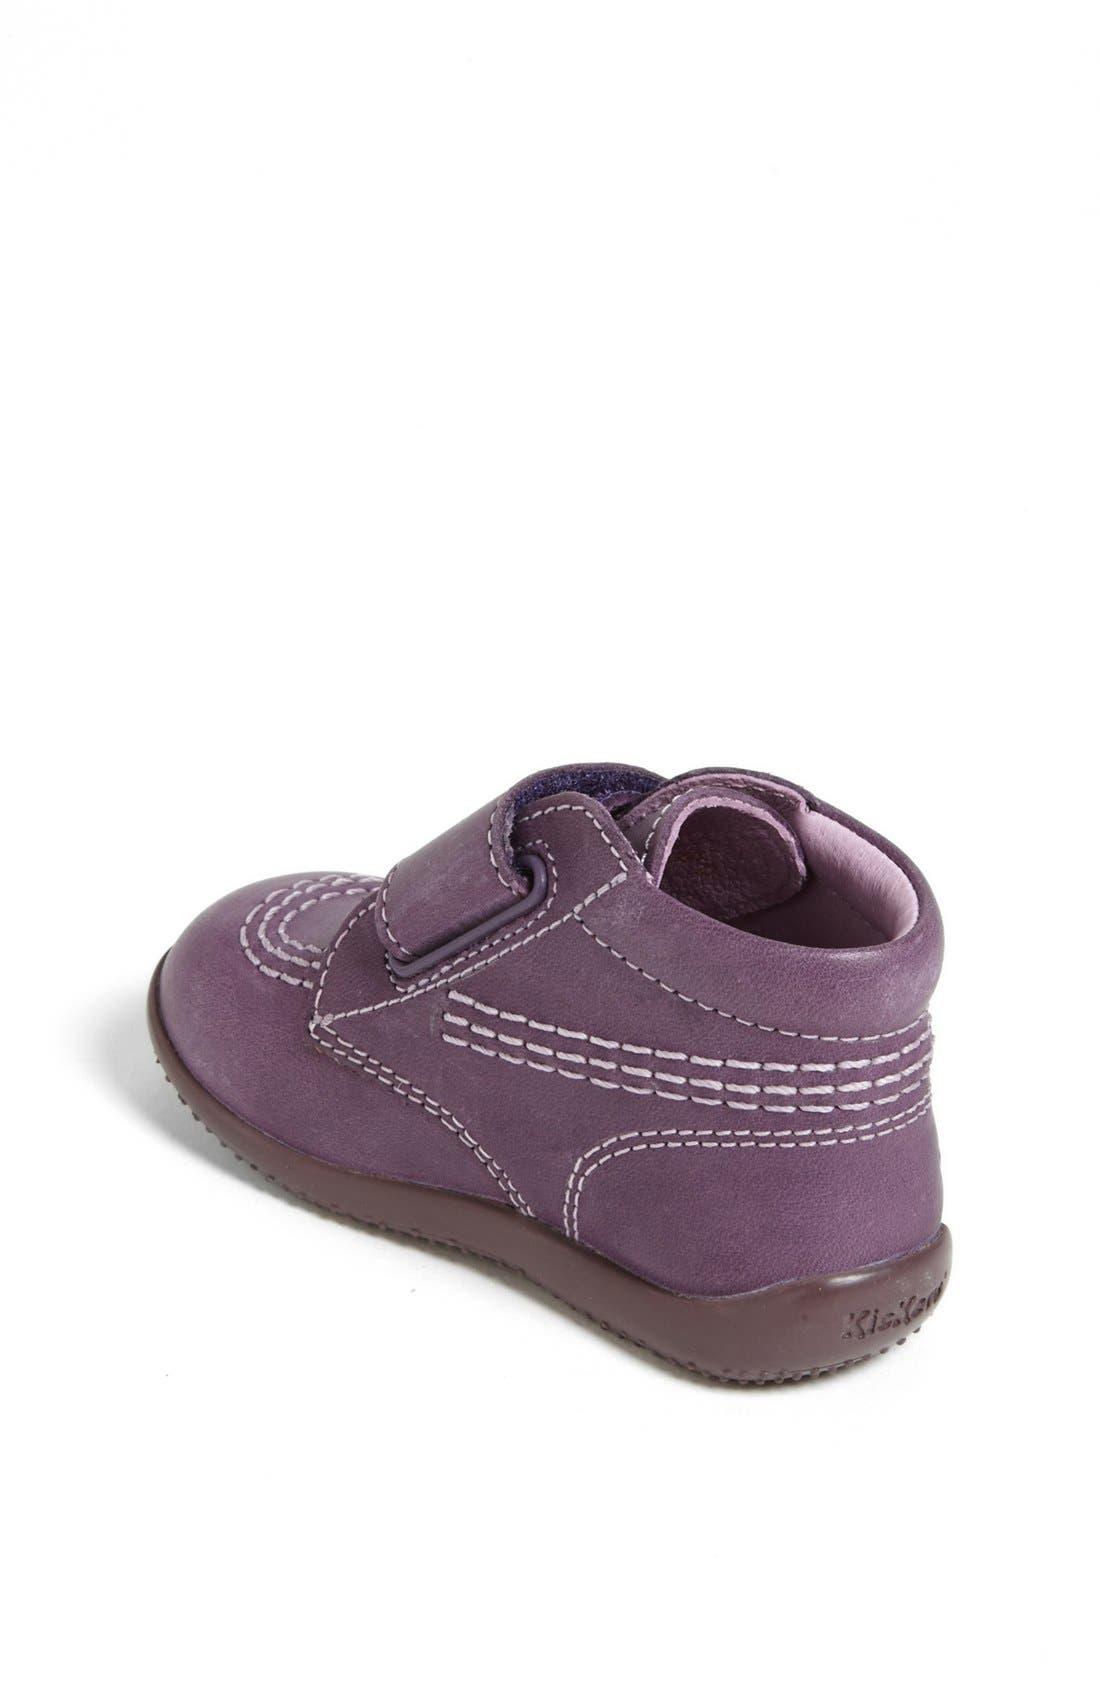 Alternate Image 2  - Kickers 'Bilou 2' Boot (Baby, Walker & Toddler)